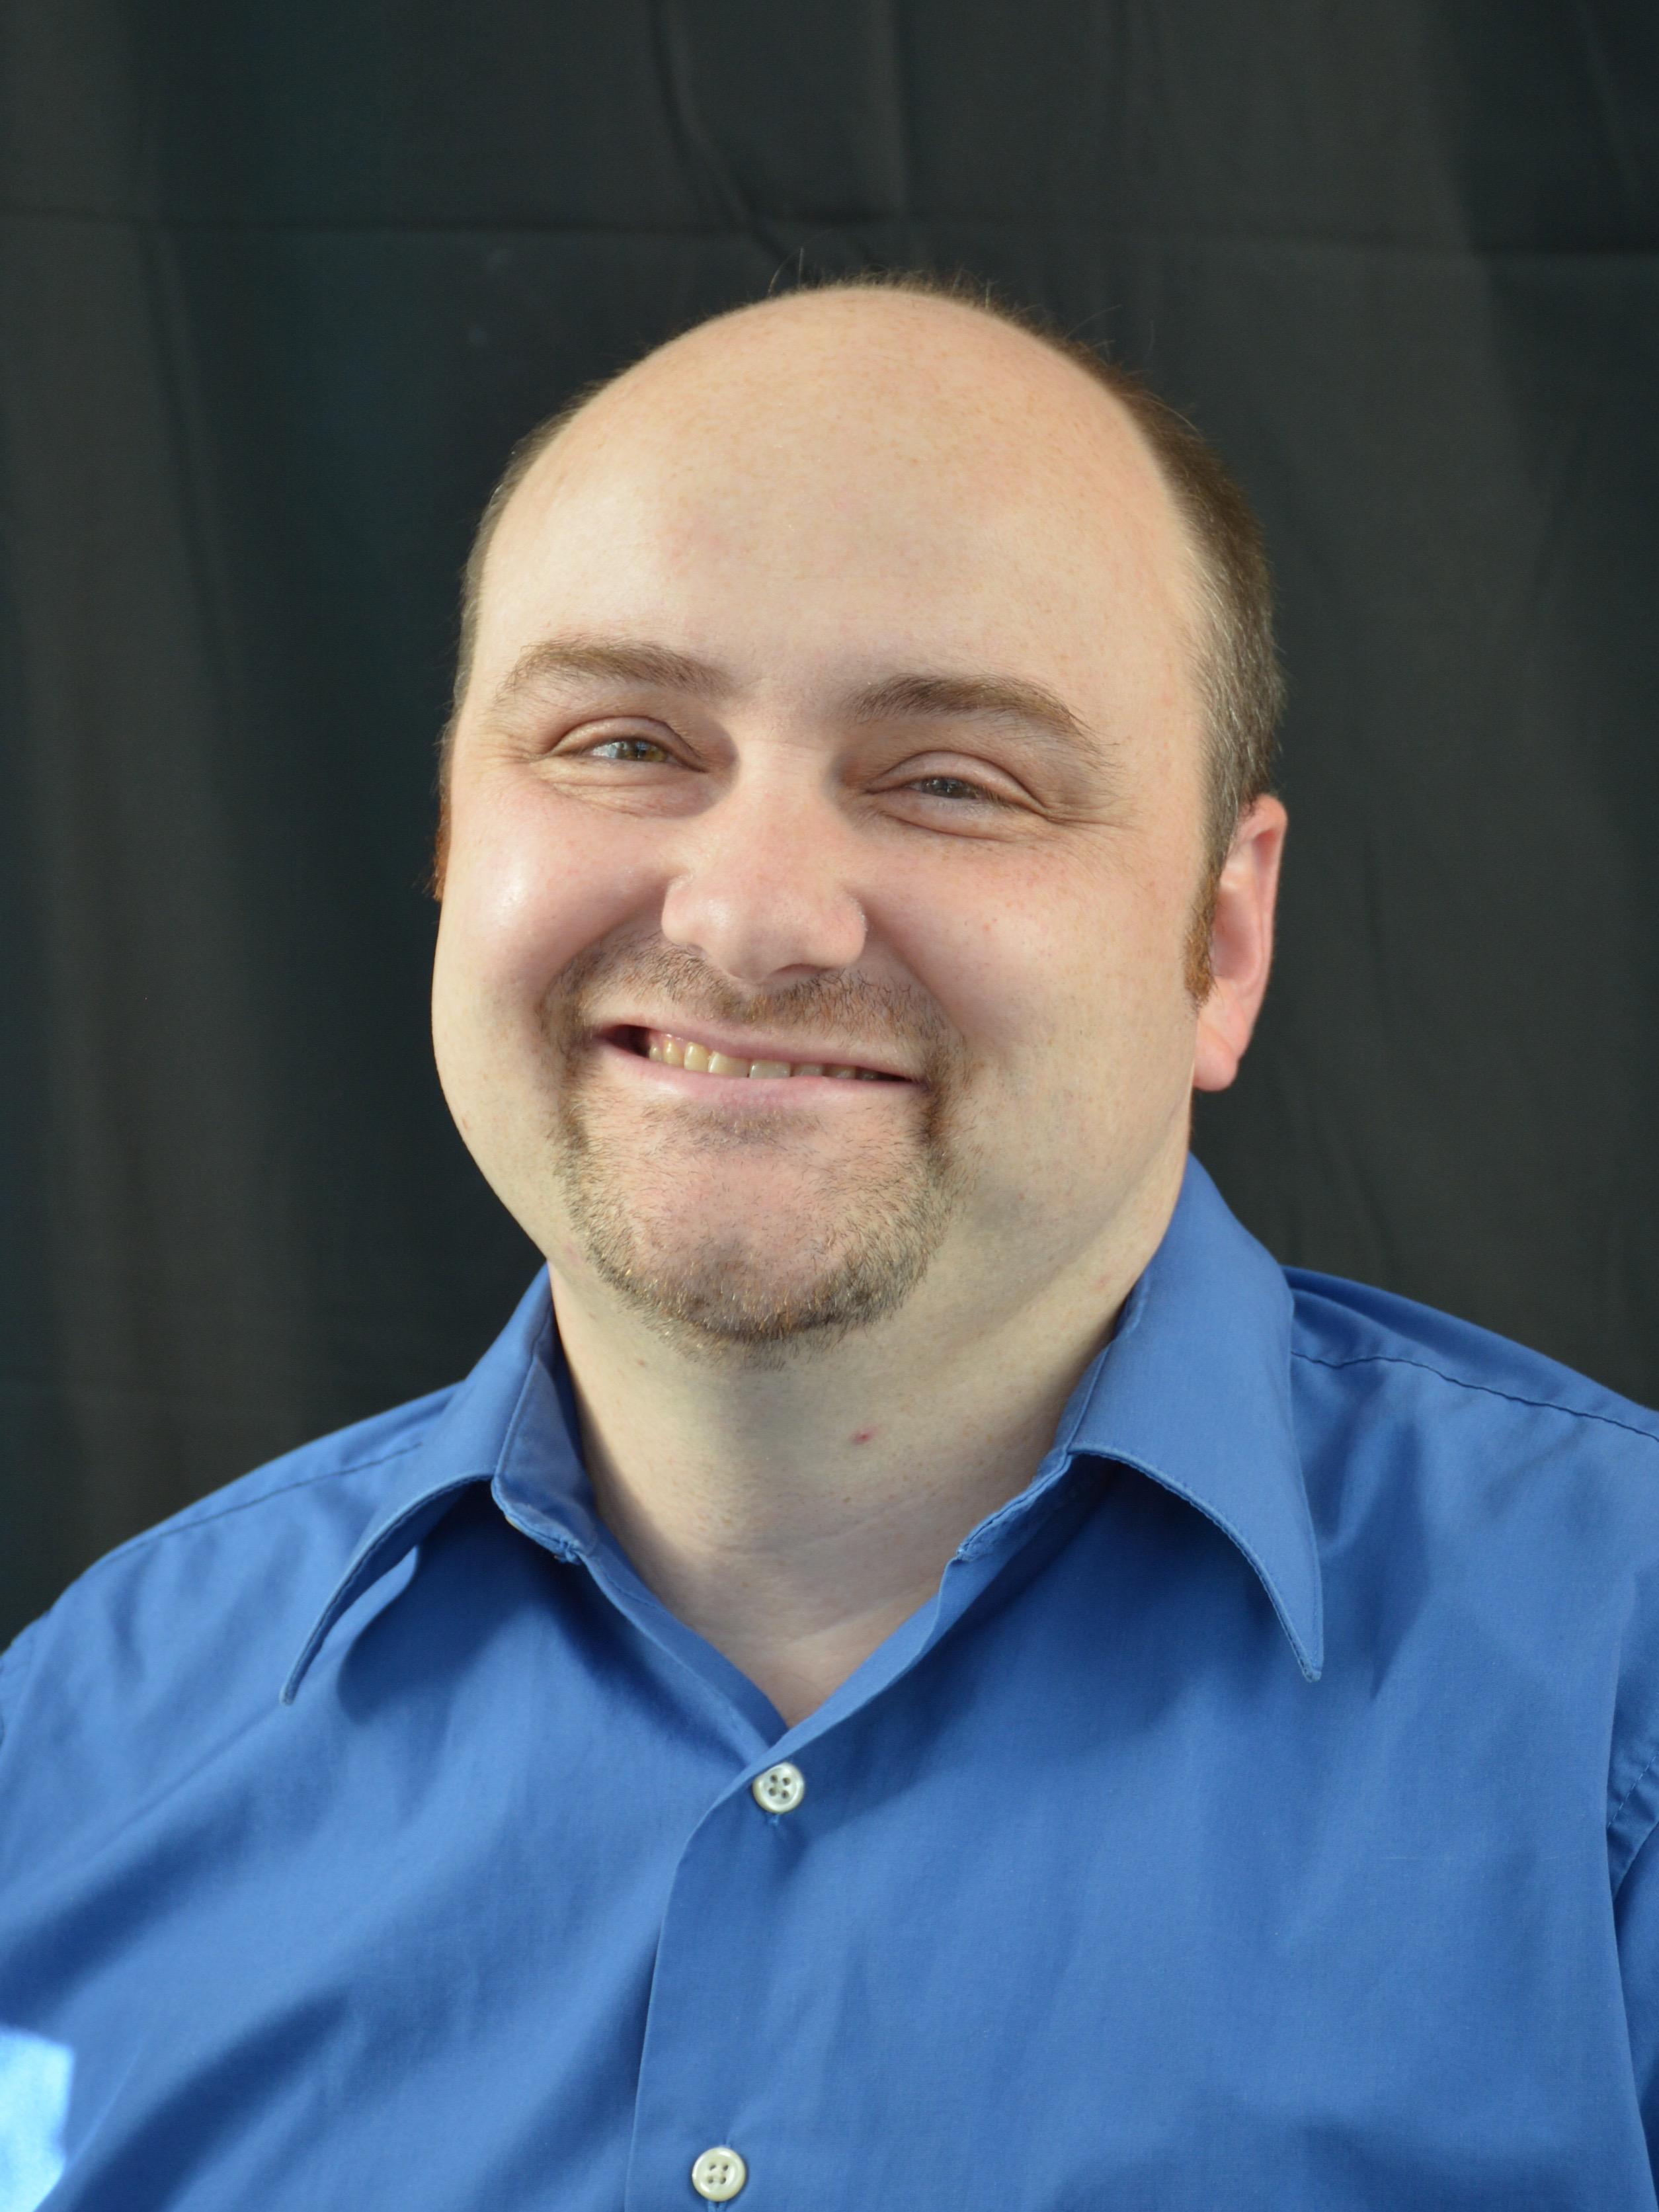 Craig Limb, LCSW